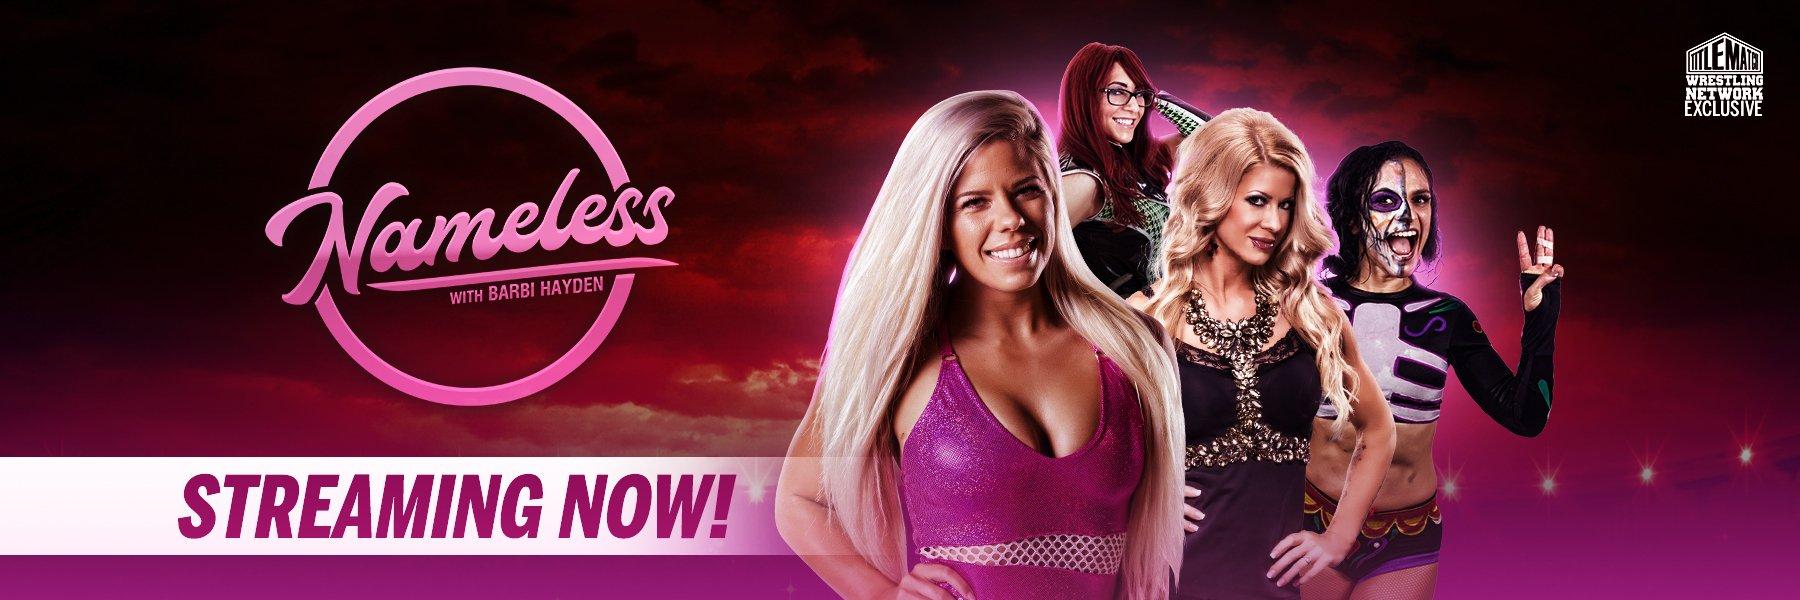 Only on Title Match: New Wrestling Talk Show - Nameless w/ Barbi Hayden!